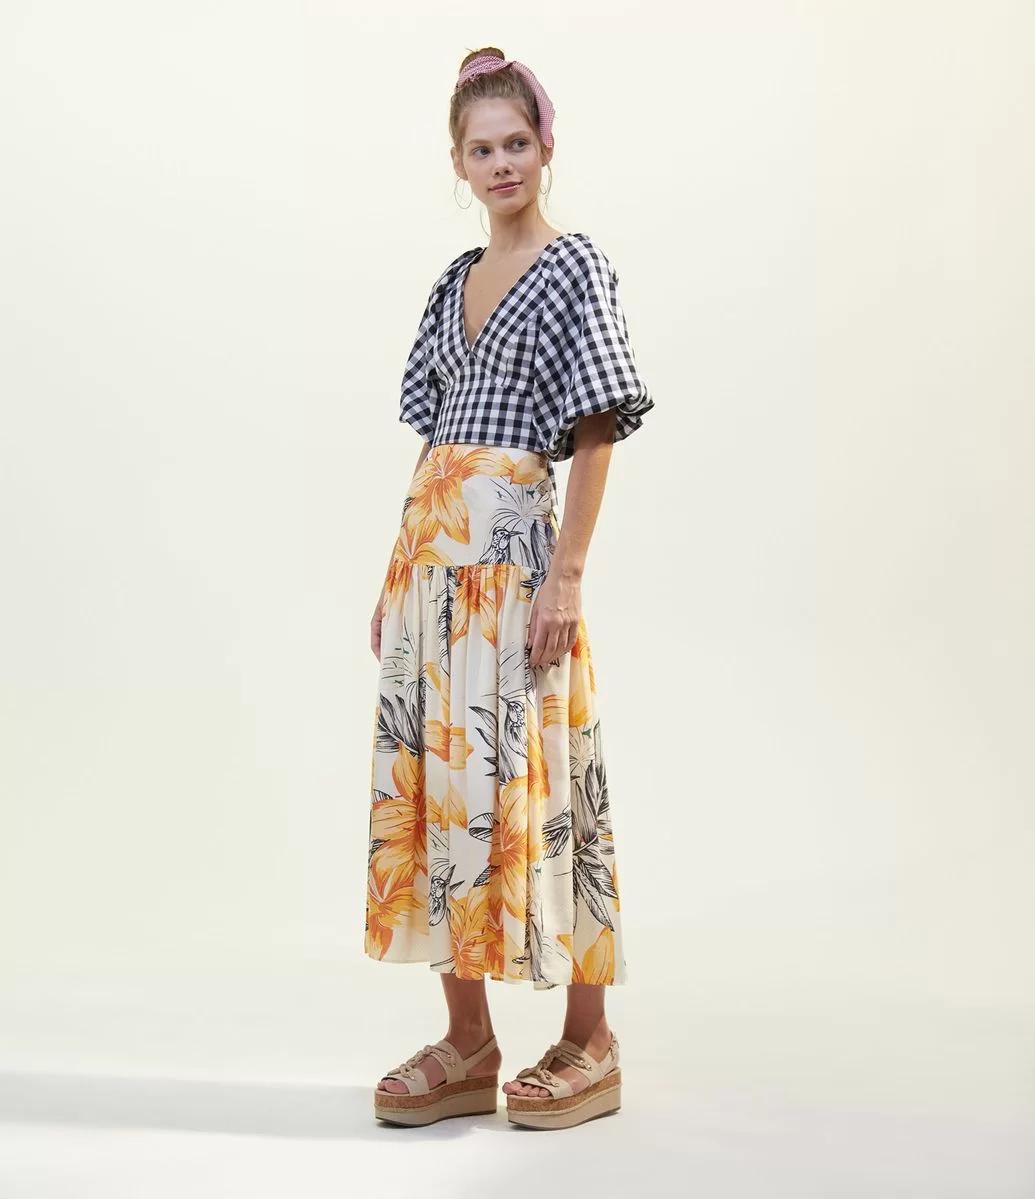 cropped xadrez 24 1 - 30 Outfits a cuadros para inspirarte y ponerte en tendencia